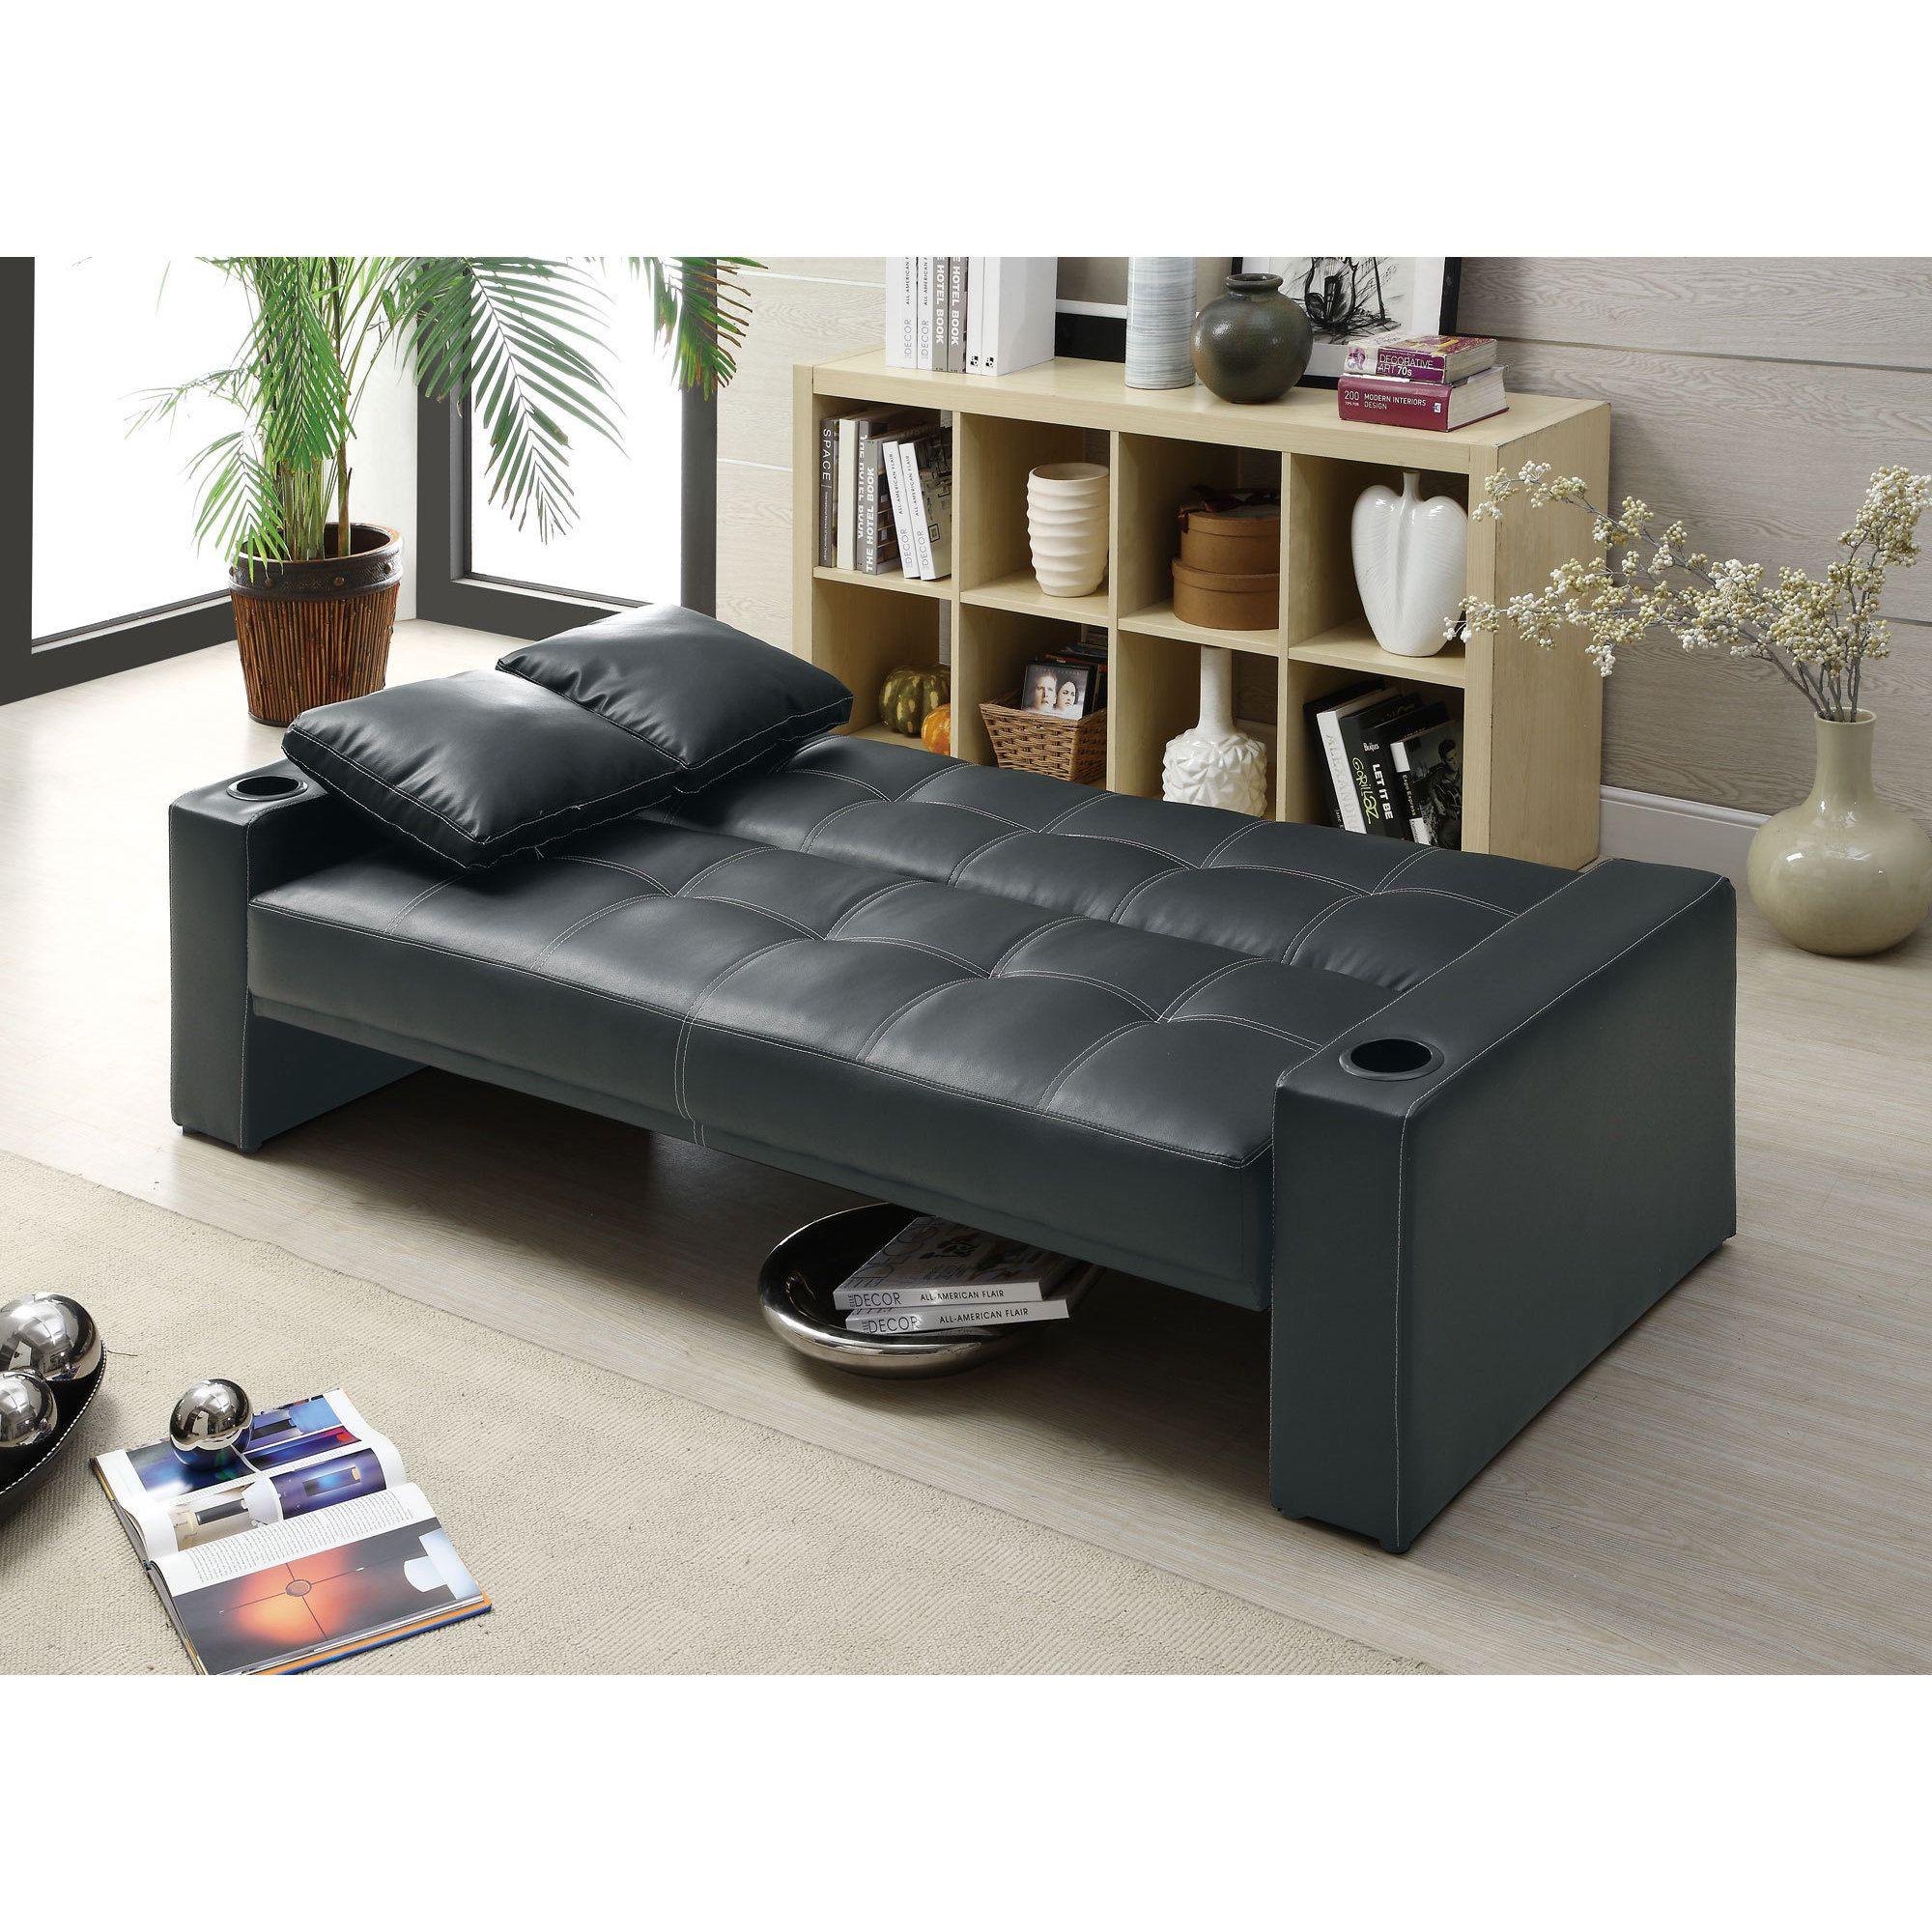 Coaster Company Black Sofa Bed Black Faux Leather Sofa Bed